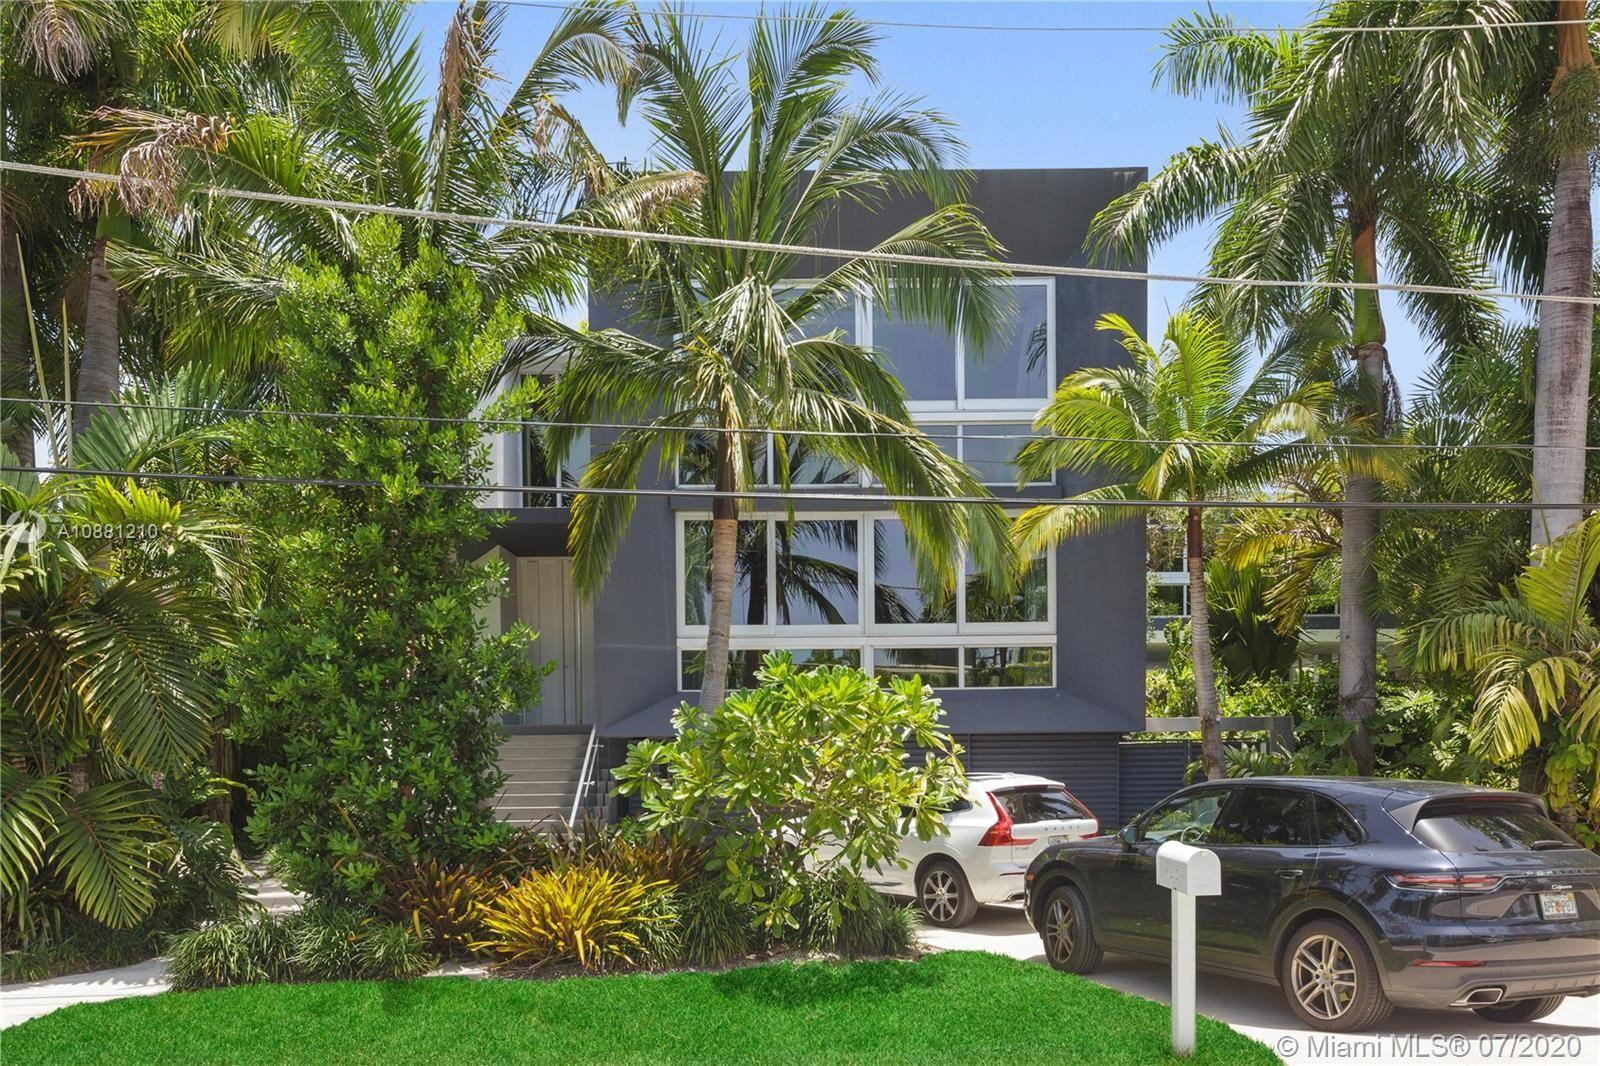 Photo of 370 S Hibiscus Dr, Miami Beach, FL 33139 (MLS # A10881210)